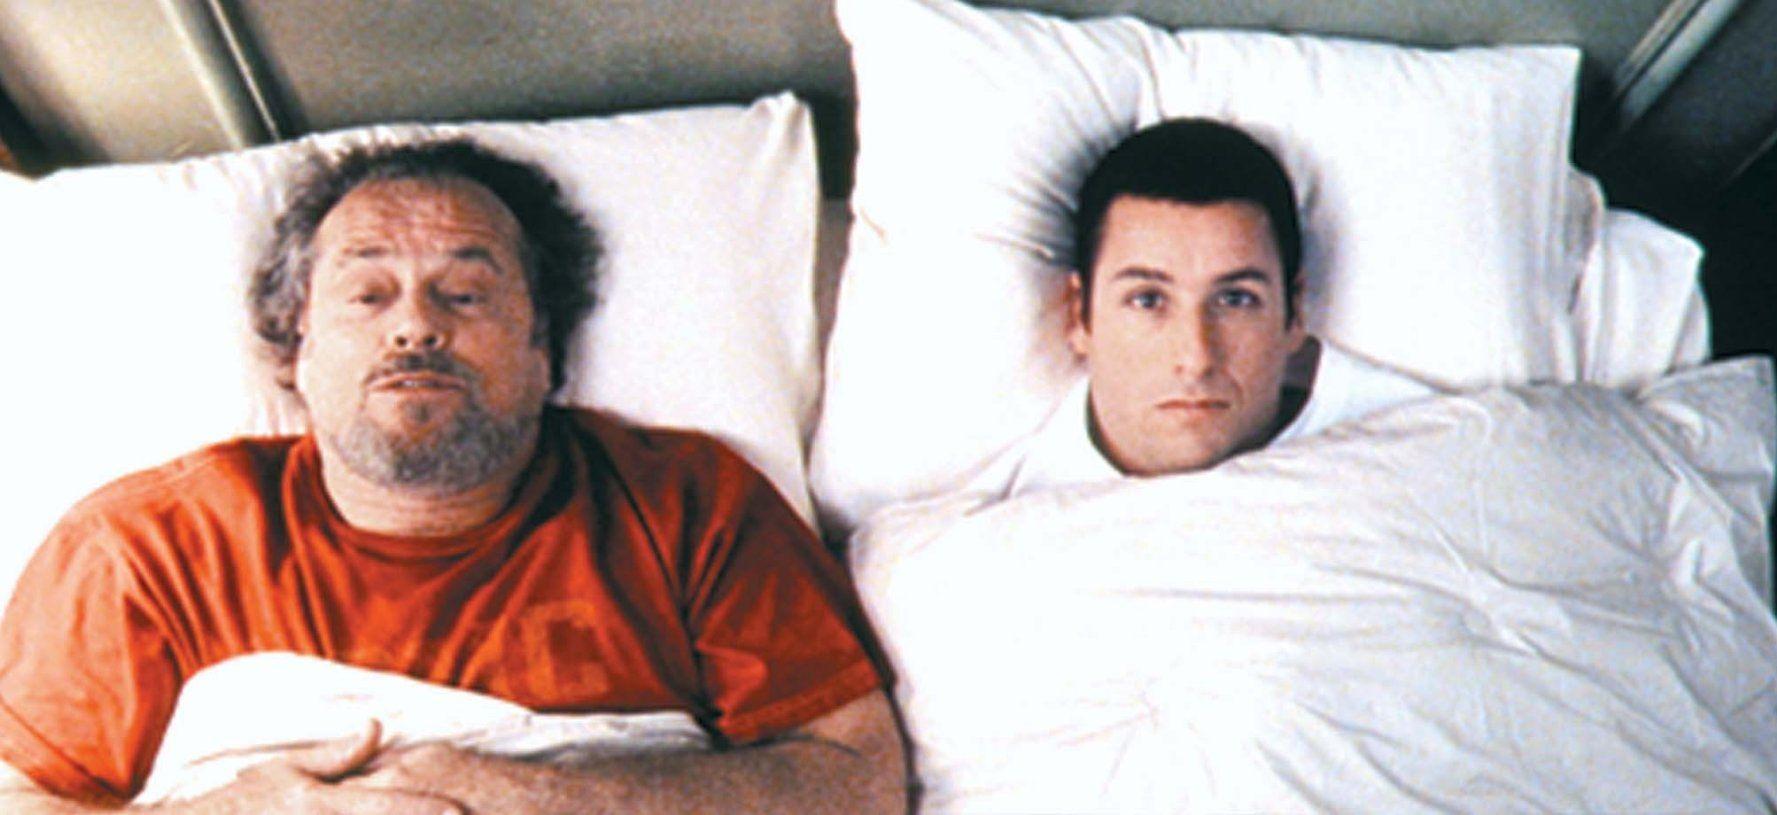 Jack Nicholson And Adam Sandler In Anger Management 2003 Peliculas